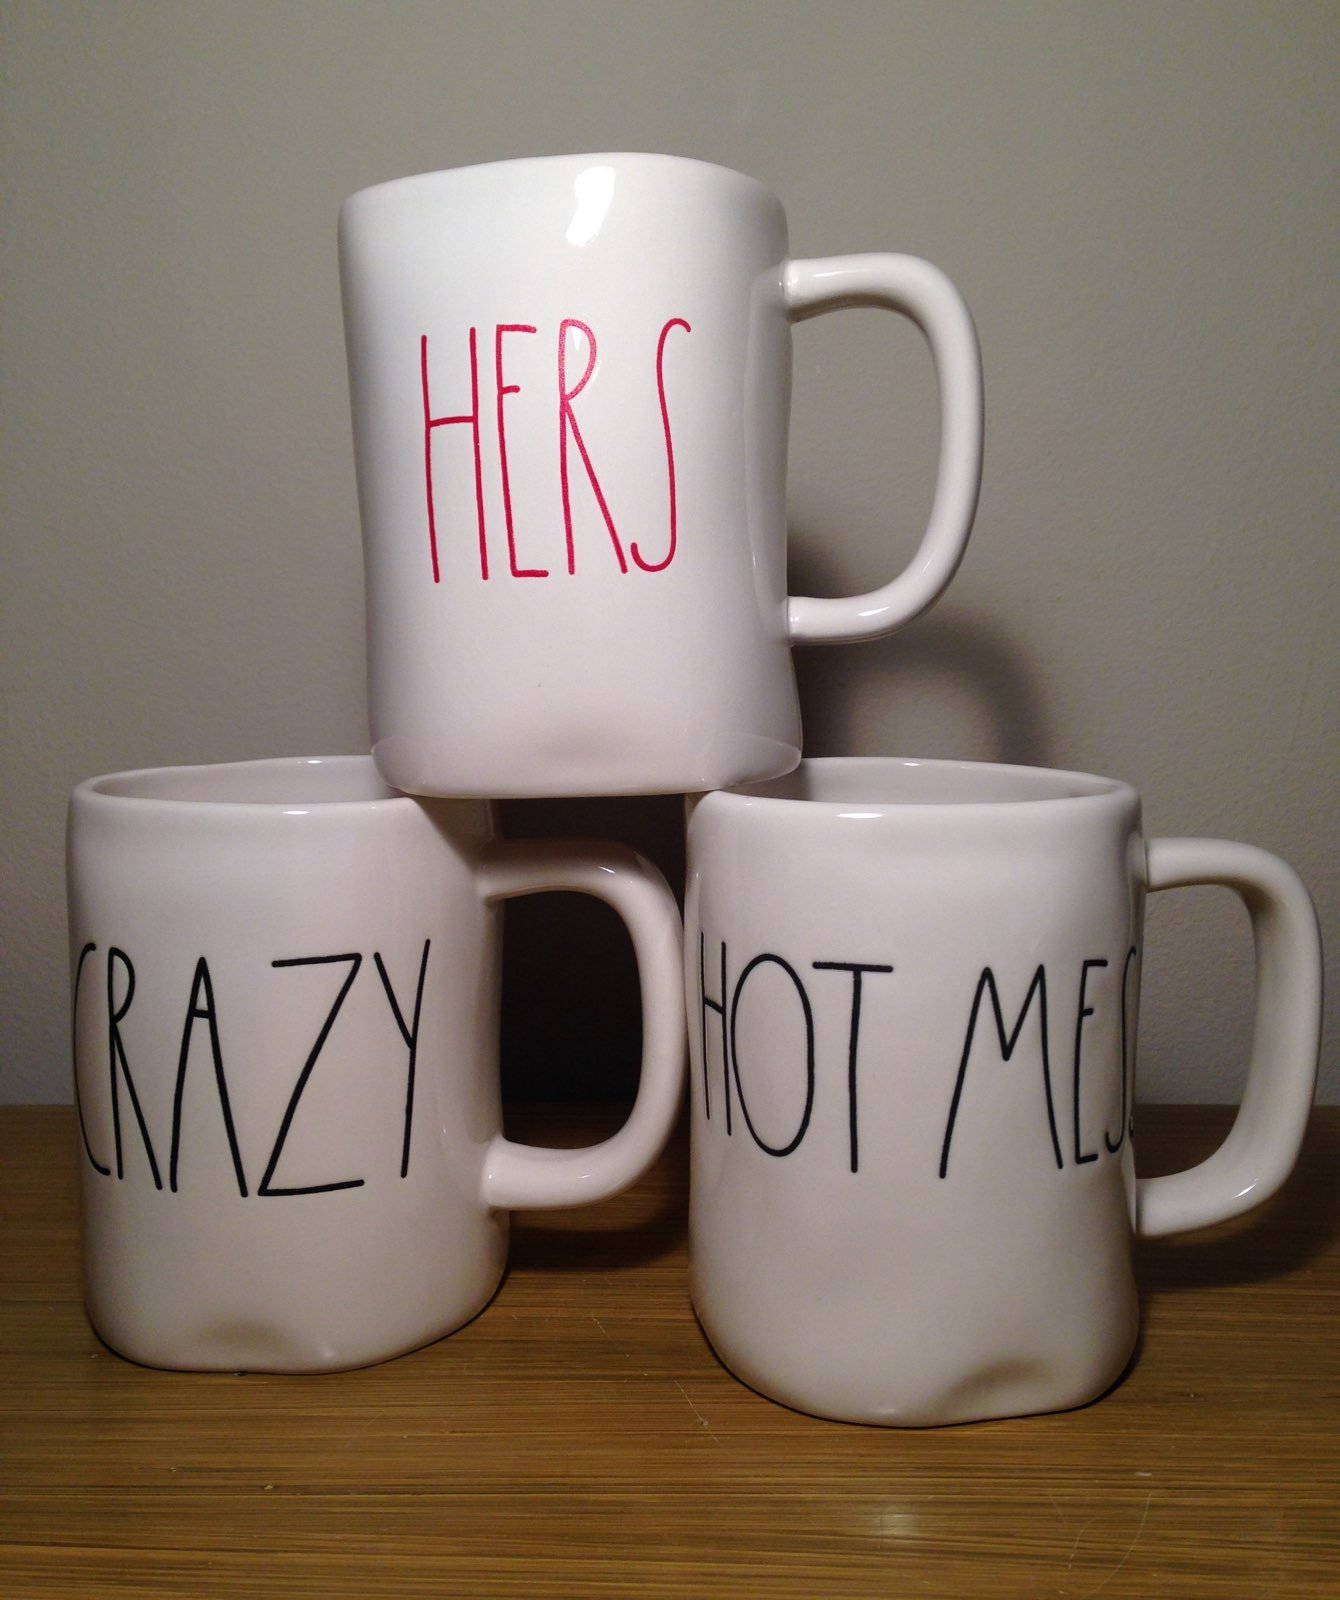 Rae Dunn Hot Mess - Hers - Crazy Mug